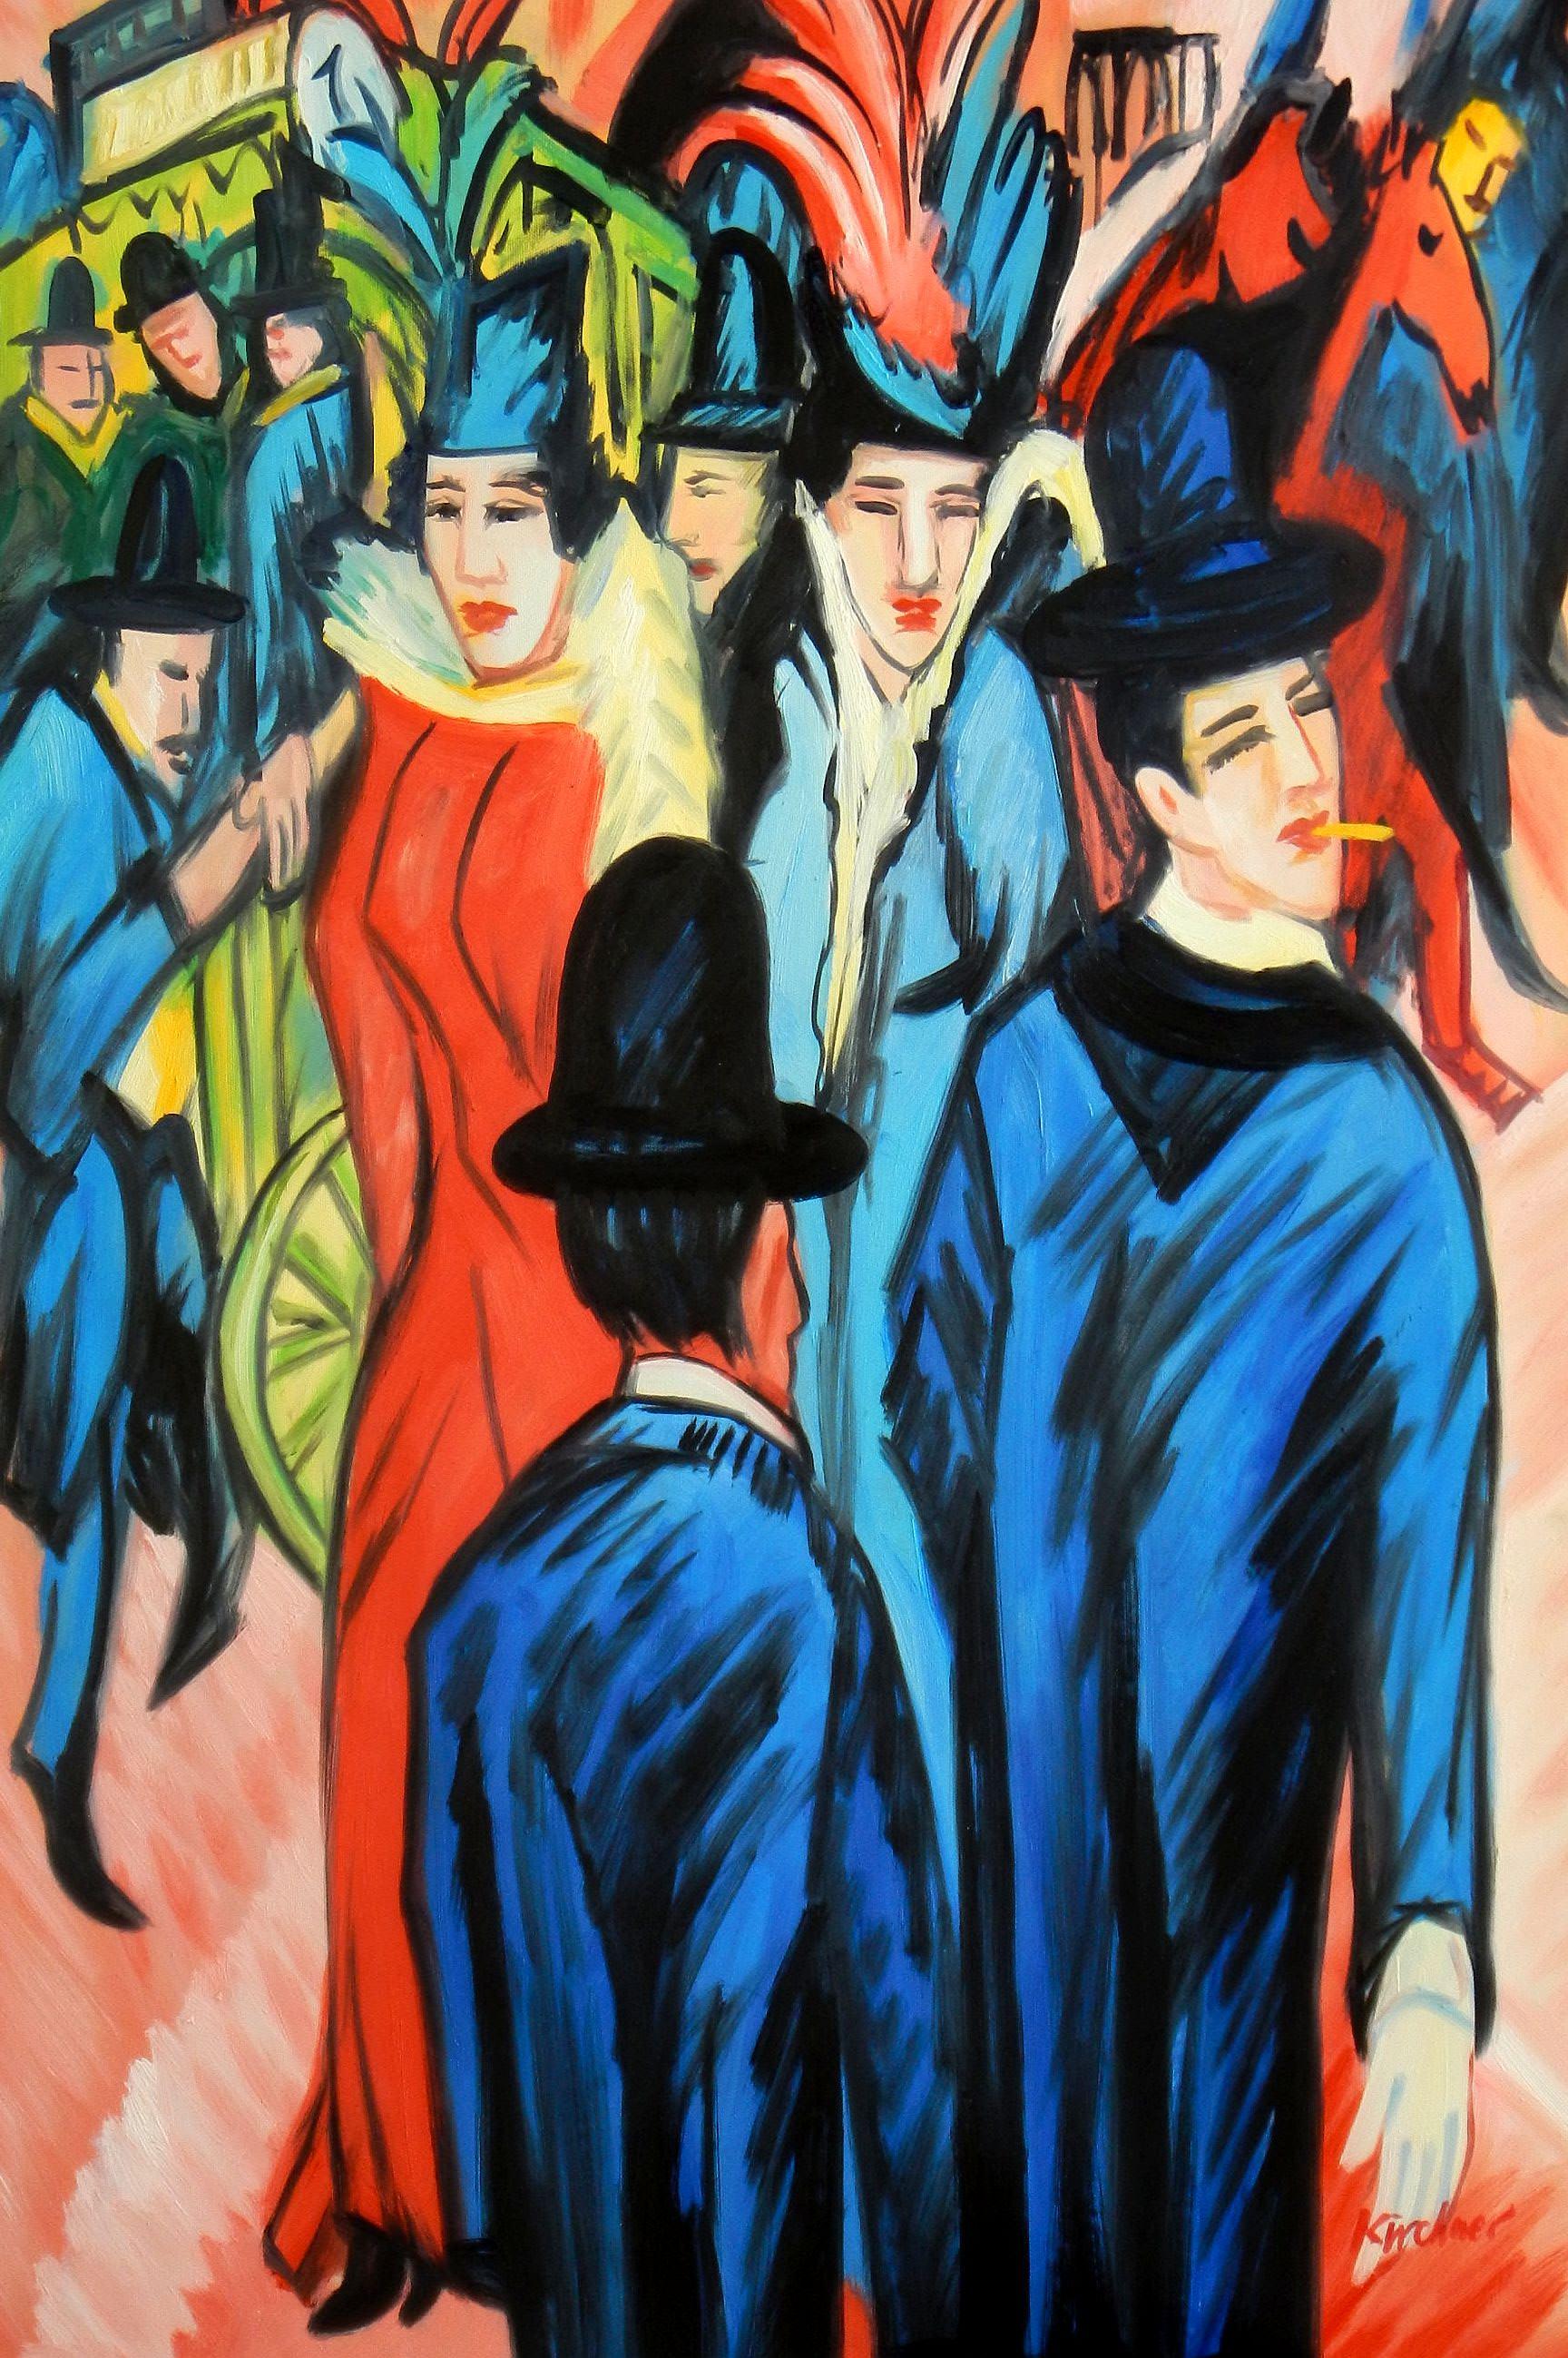 Ernst Ludwig Kirchner - Berliner Straßenszene d93710 60x90cm exquisites Ölbild